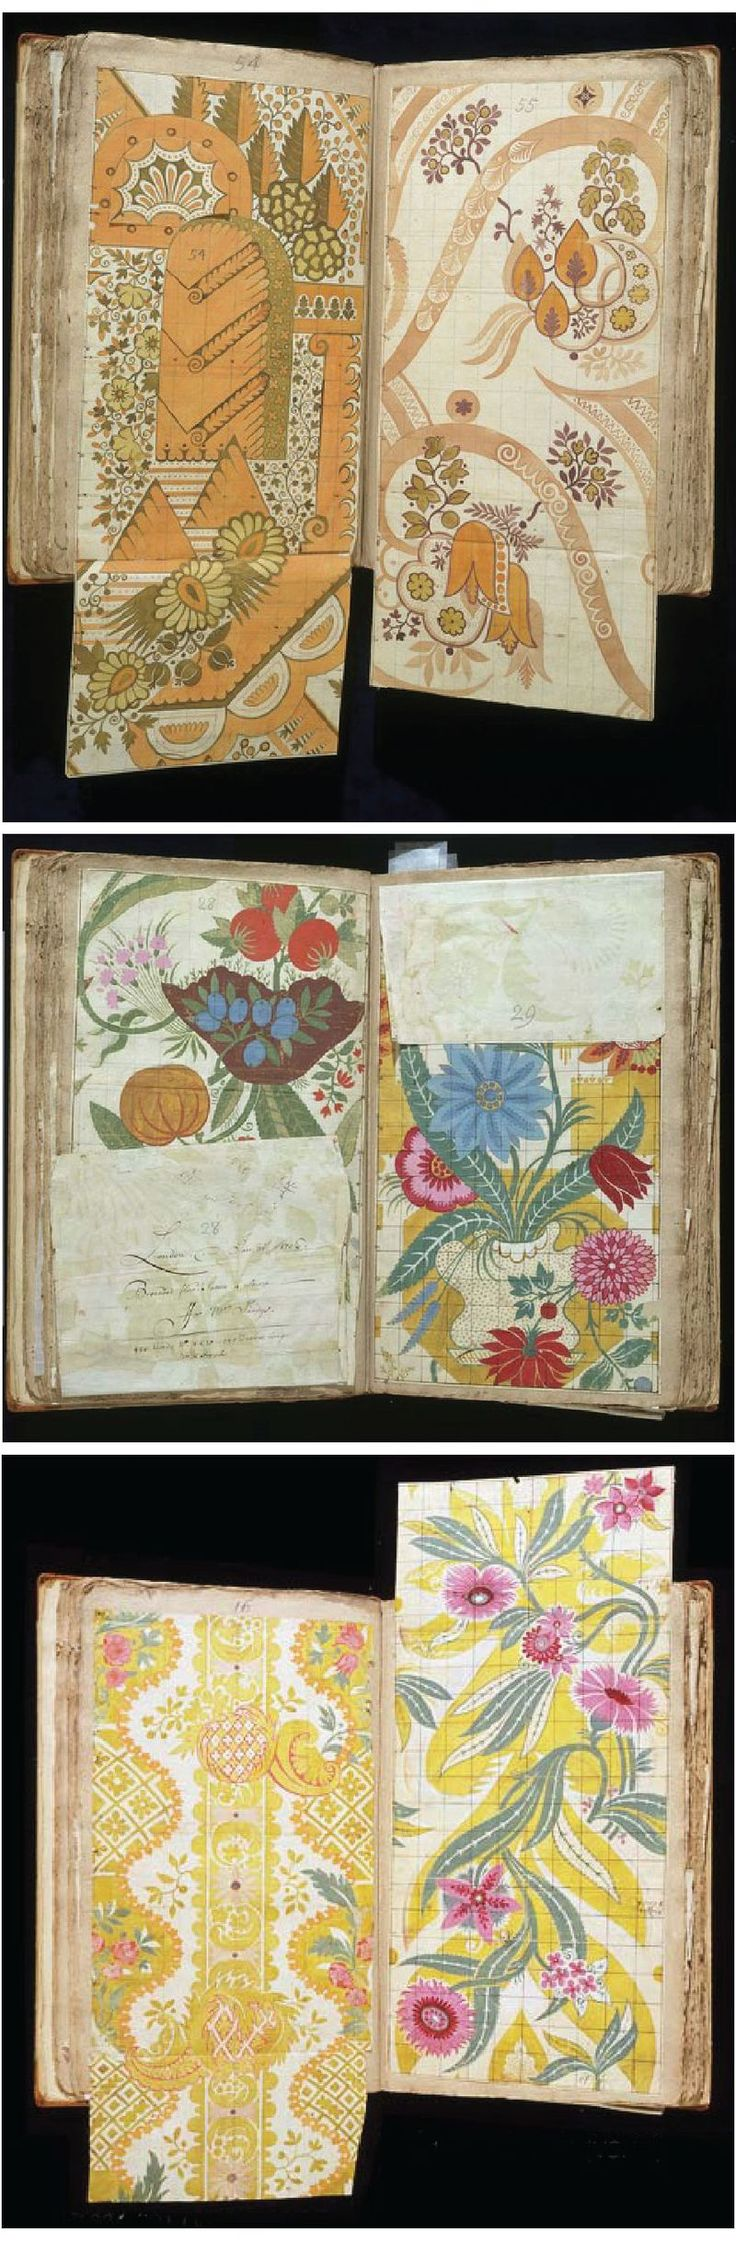 pattern designer, James Leman, born in 1688.